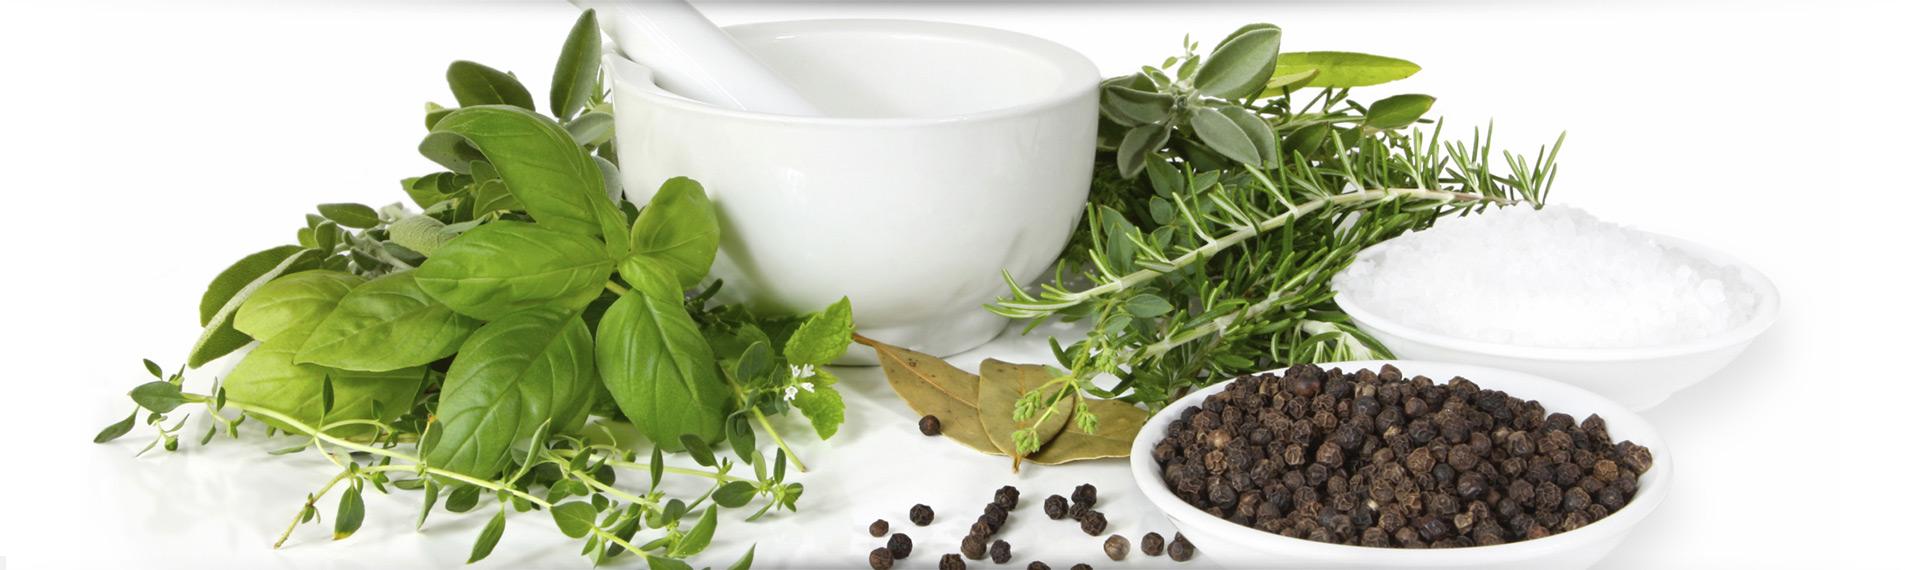 Herboristería Itziar – Salud Natural en San Sebastián